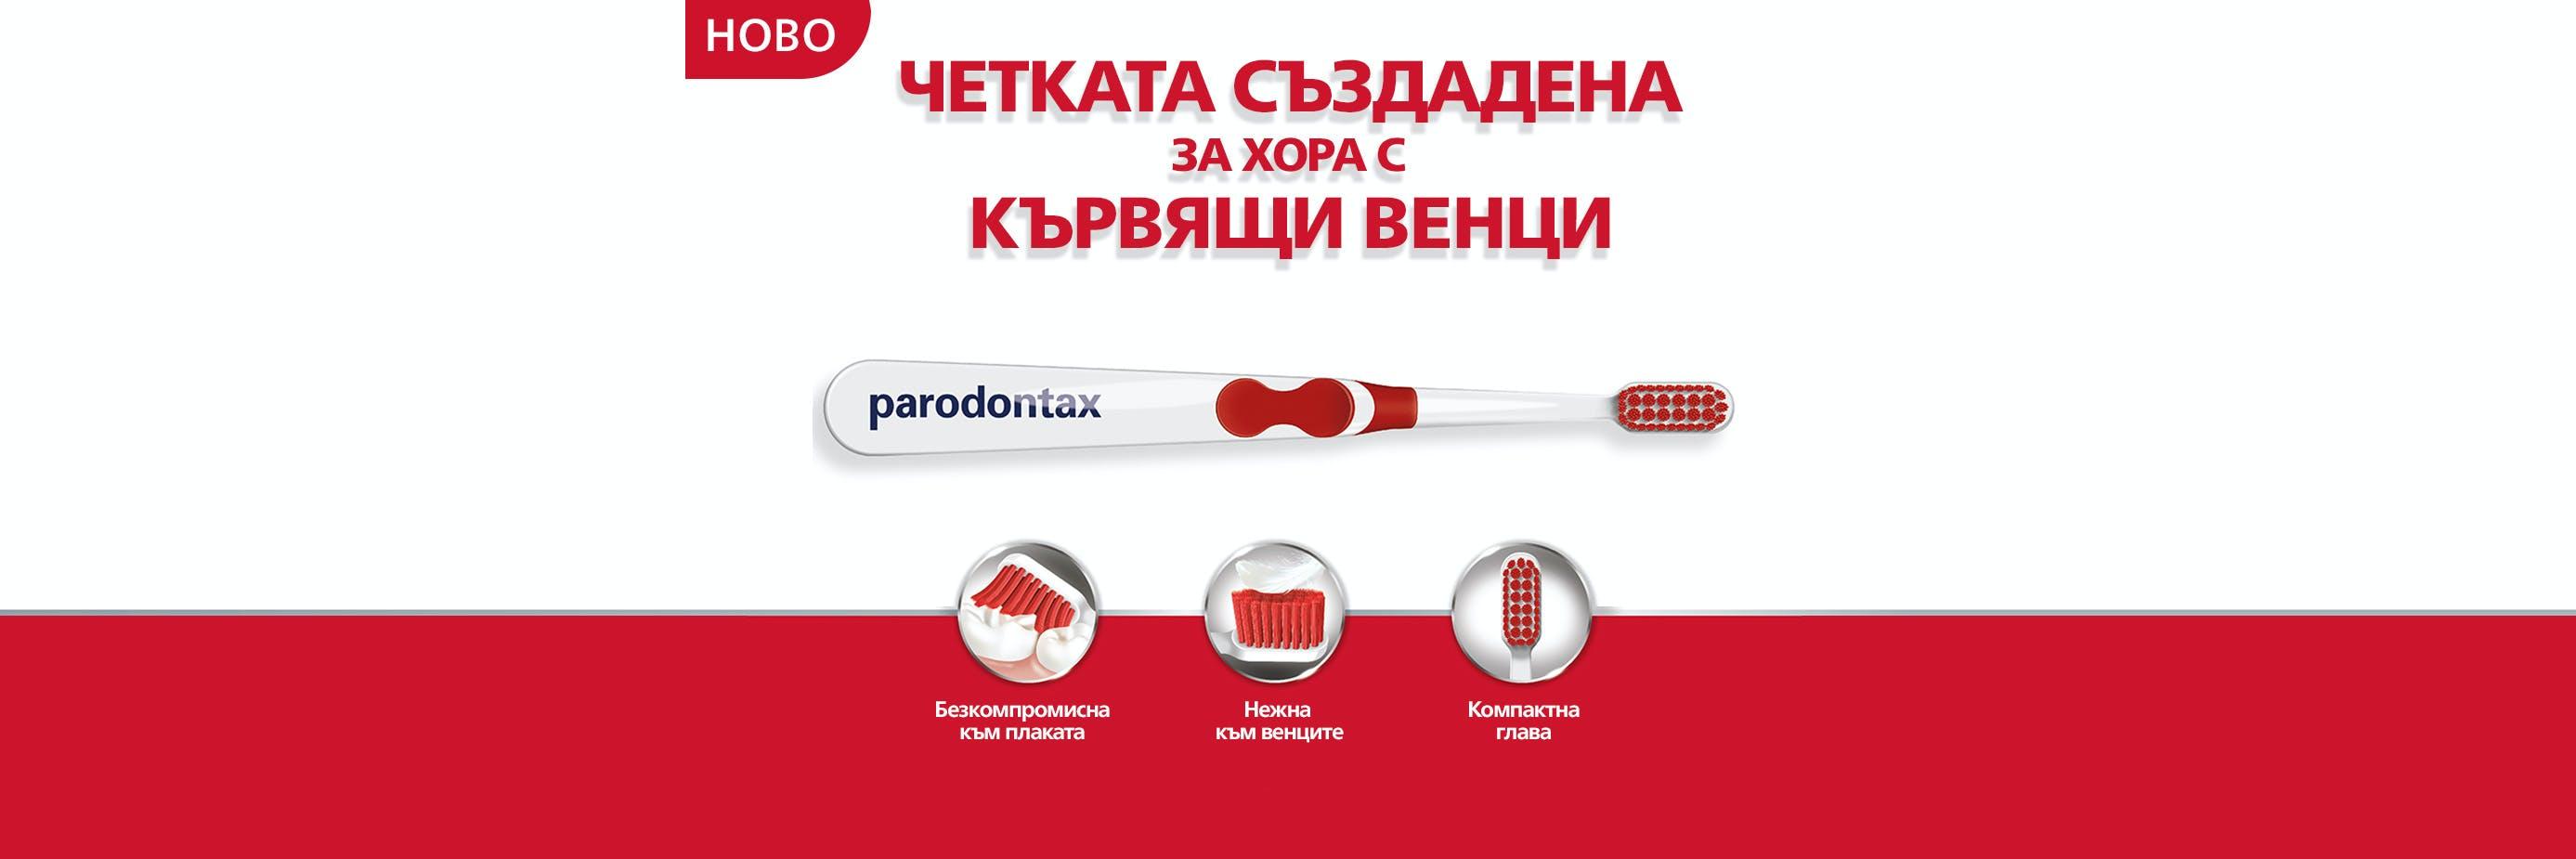 PDX_KV_APPROVED_170817